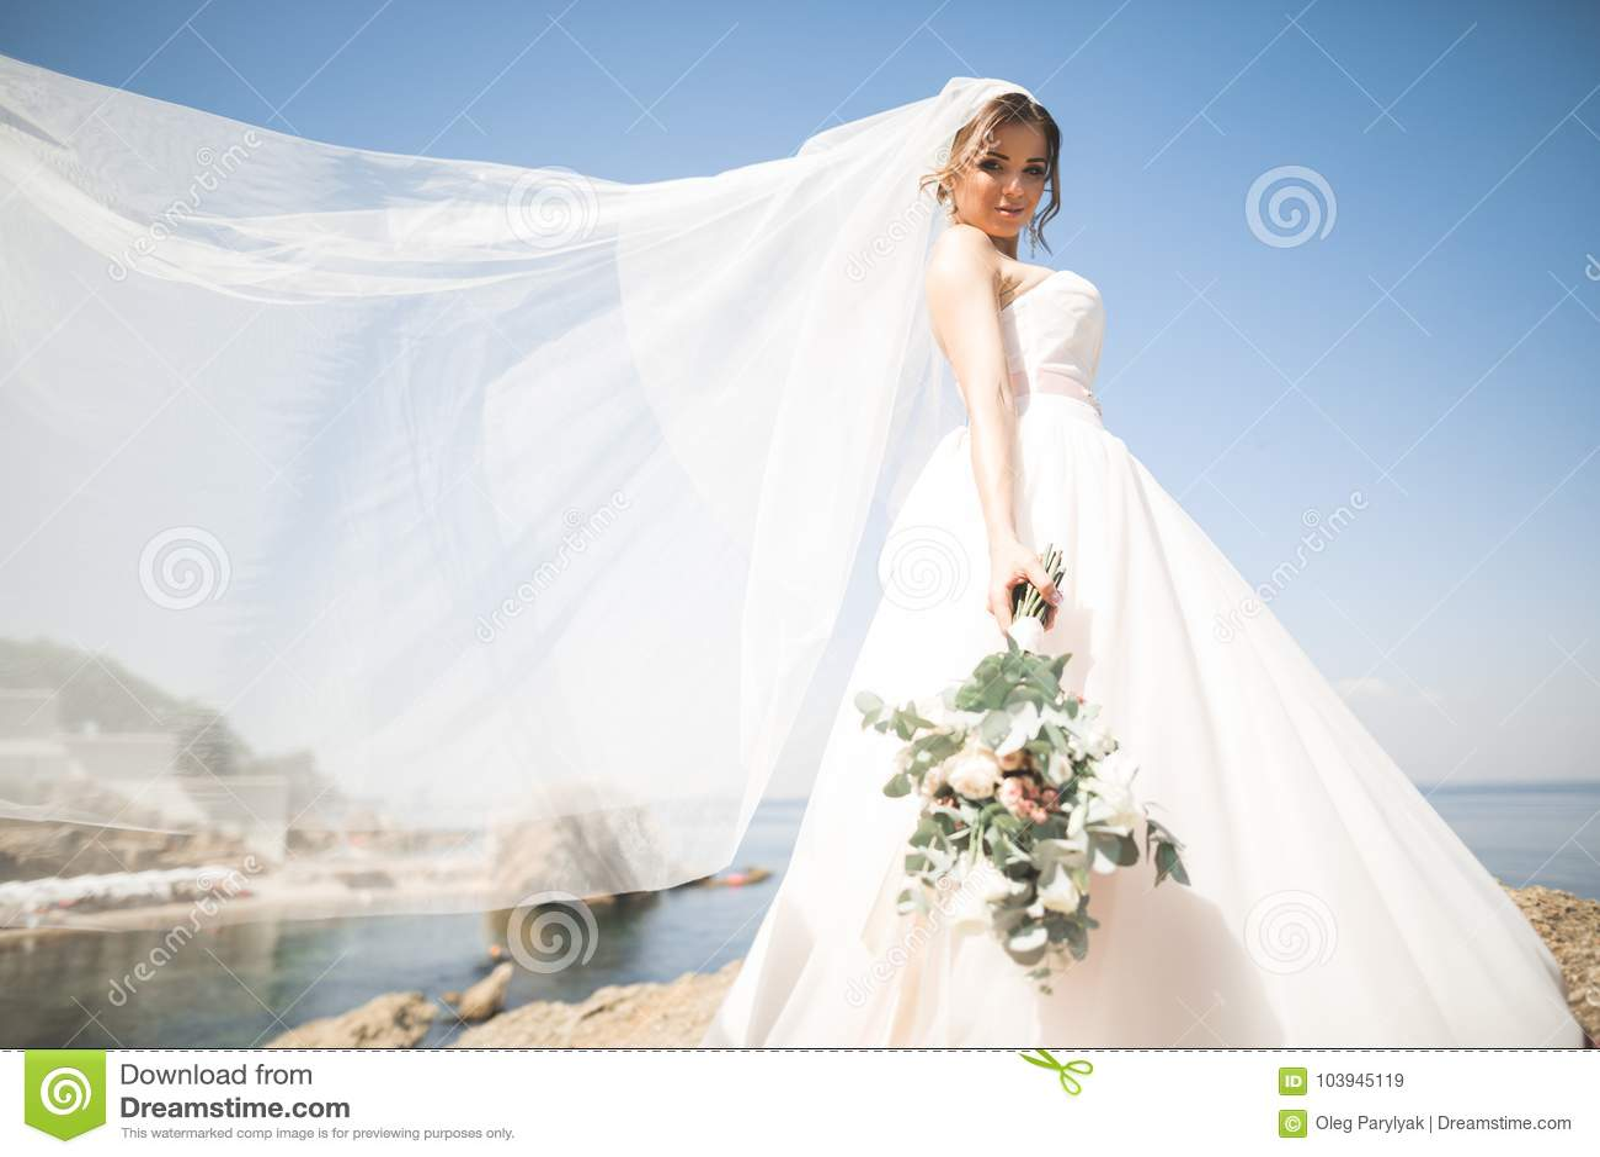 Vestido de novia precioso blanco